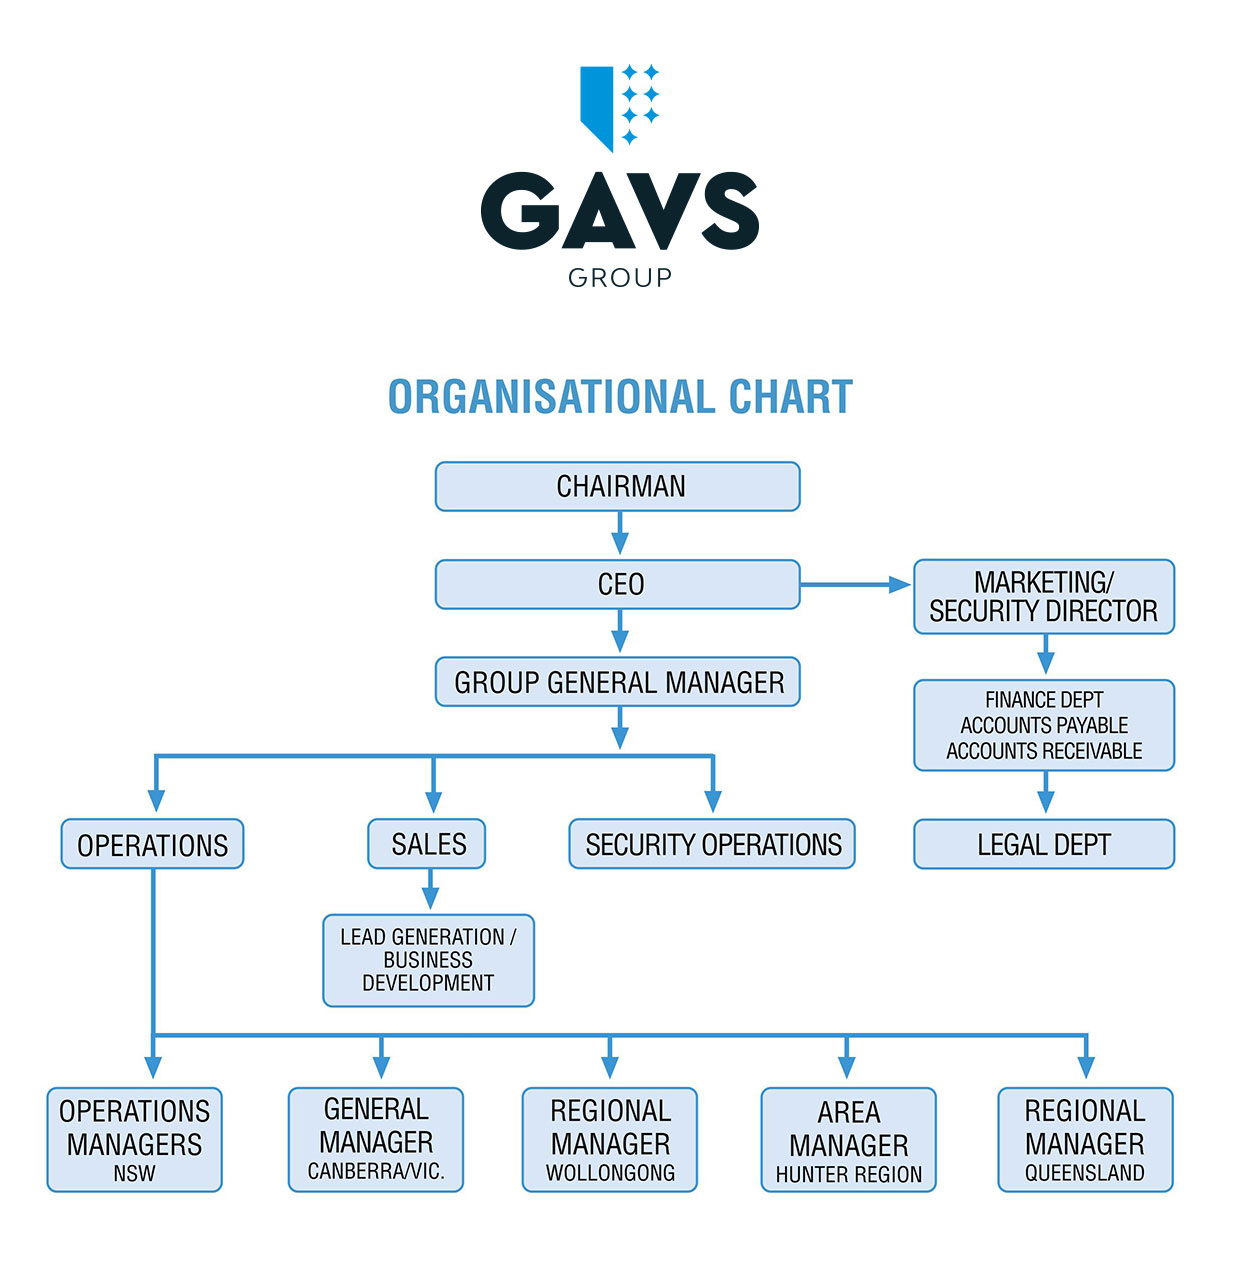 gavs group organisational chart